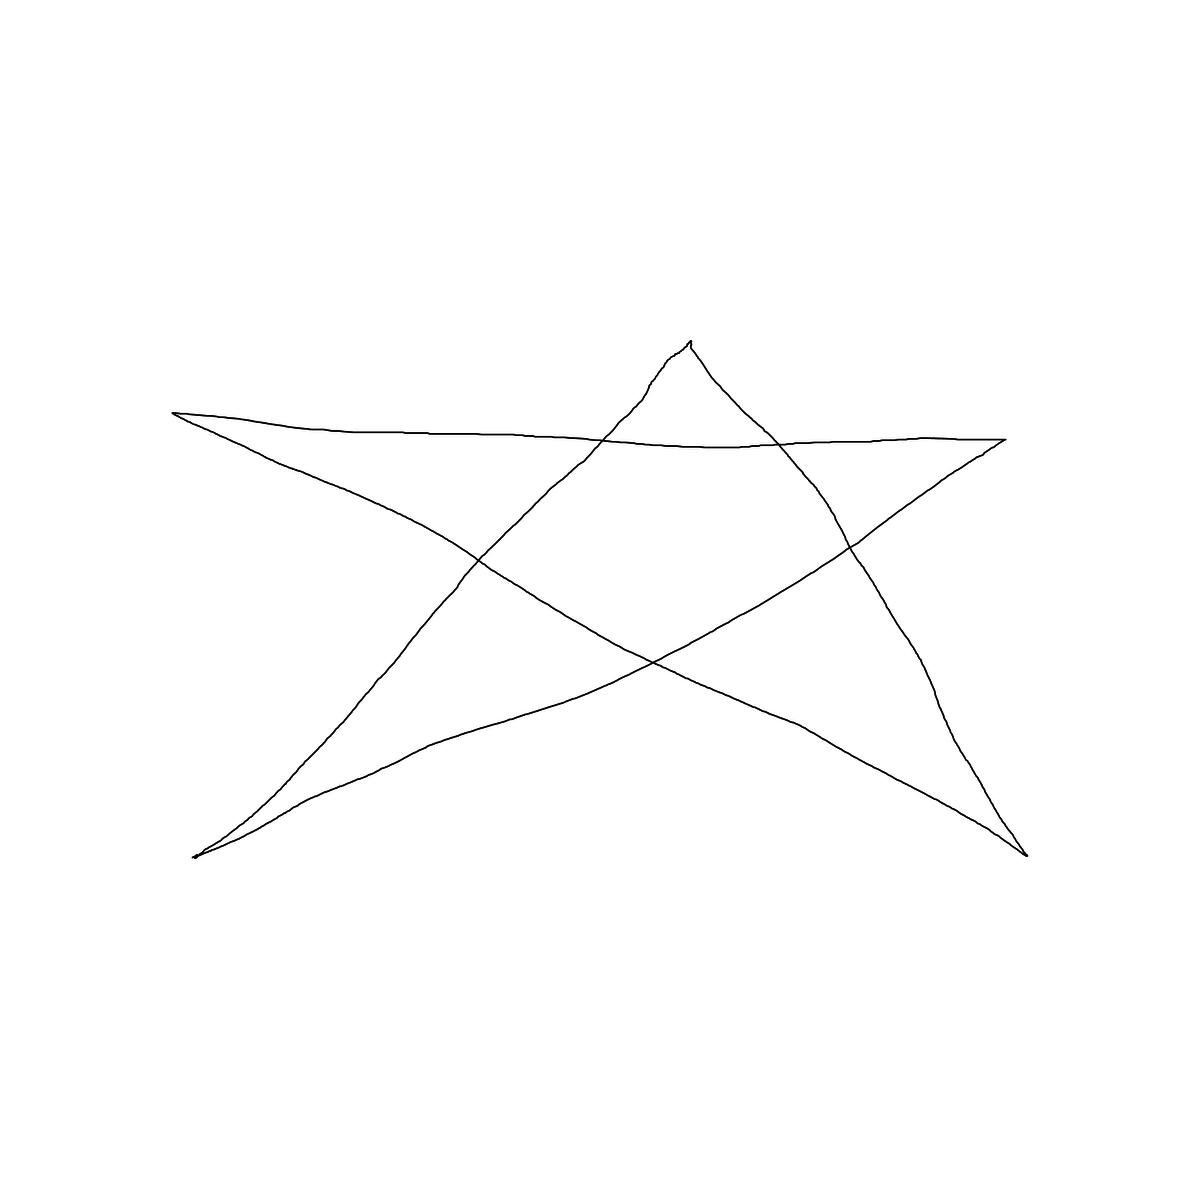 BAAAM drawing#14416 lat:24.0314121246337900lng: -12.6013193130493160